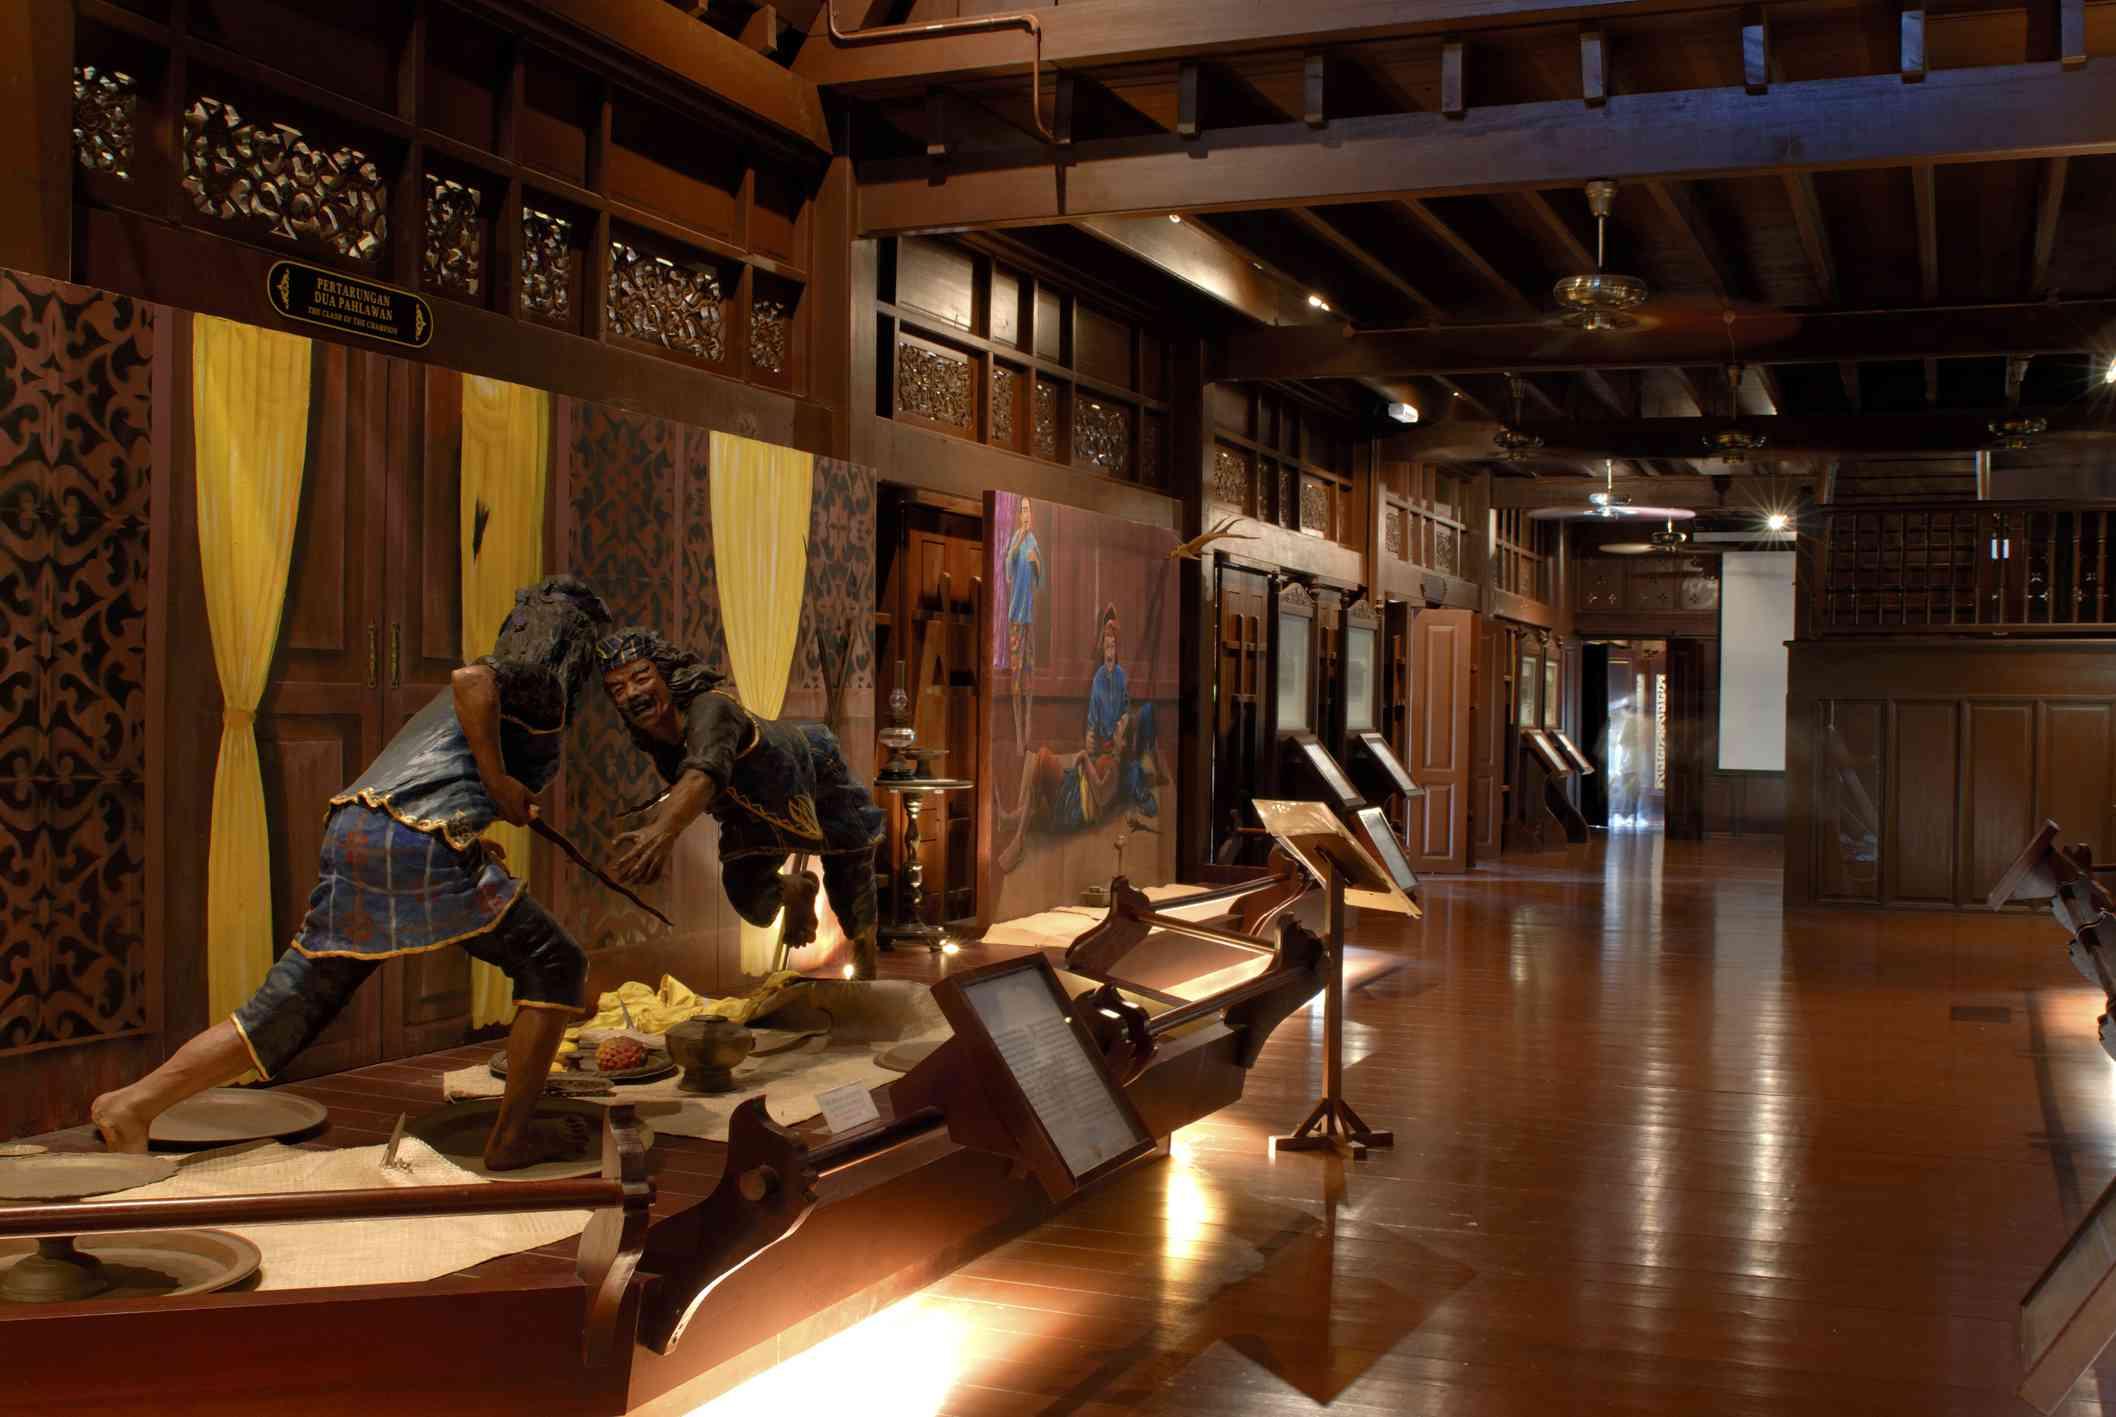 Hang Tuah diorama, Malacca Sultanate Museum